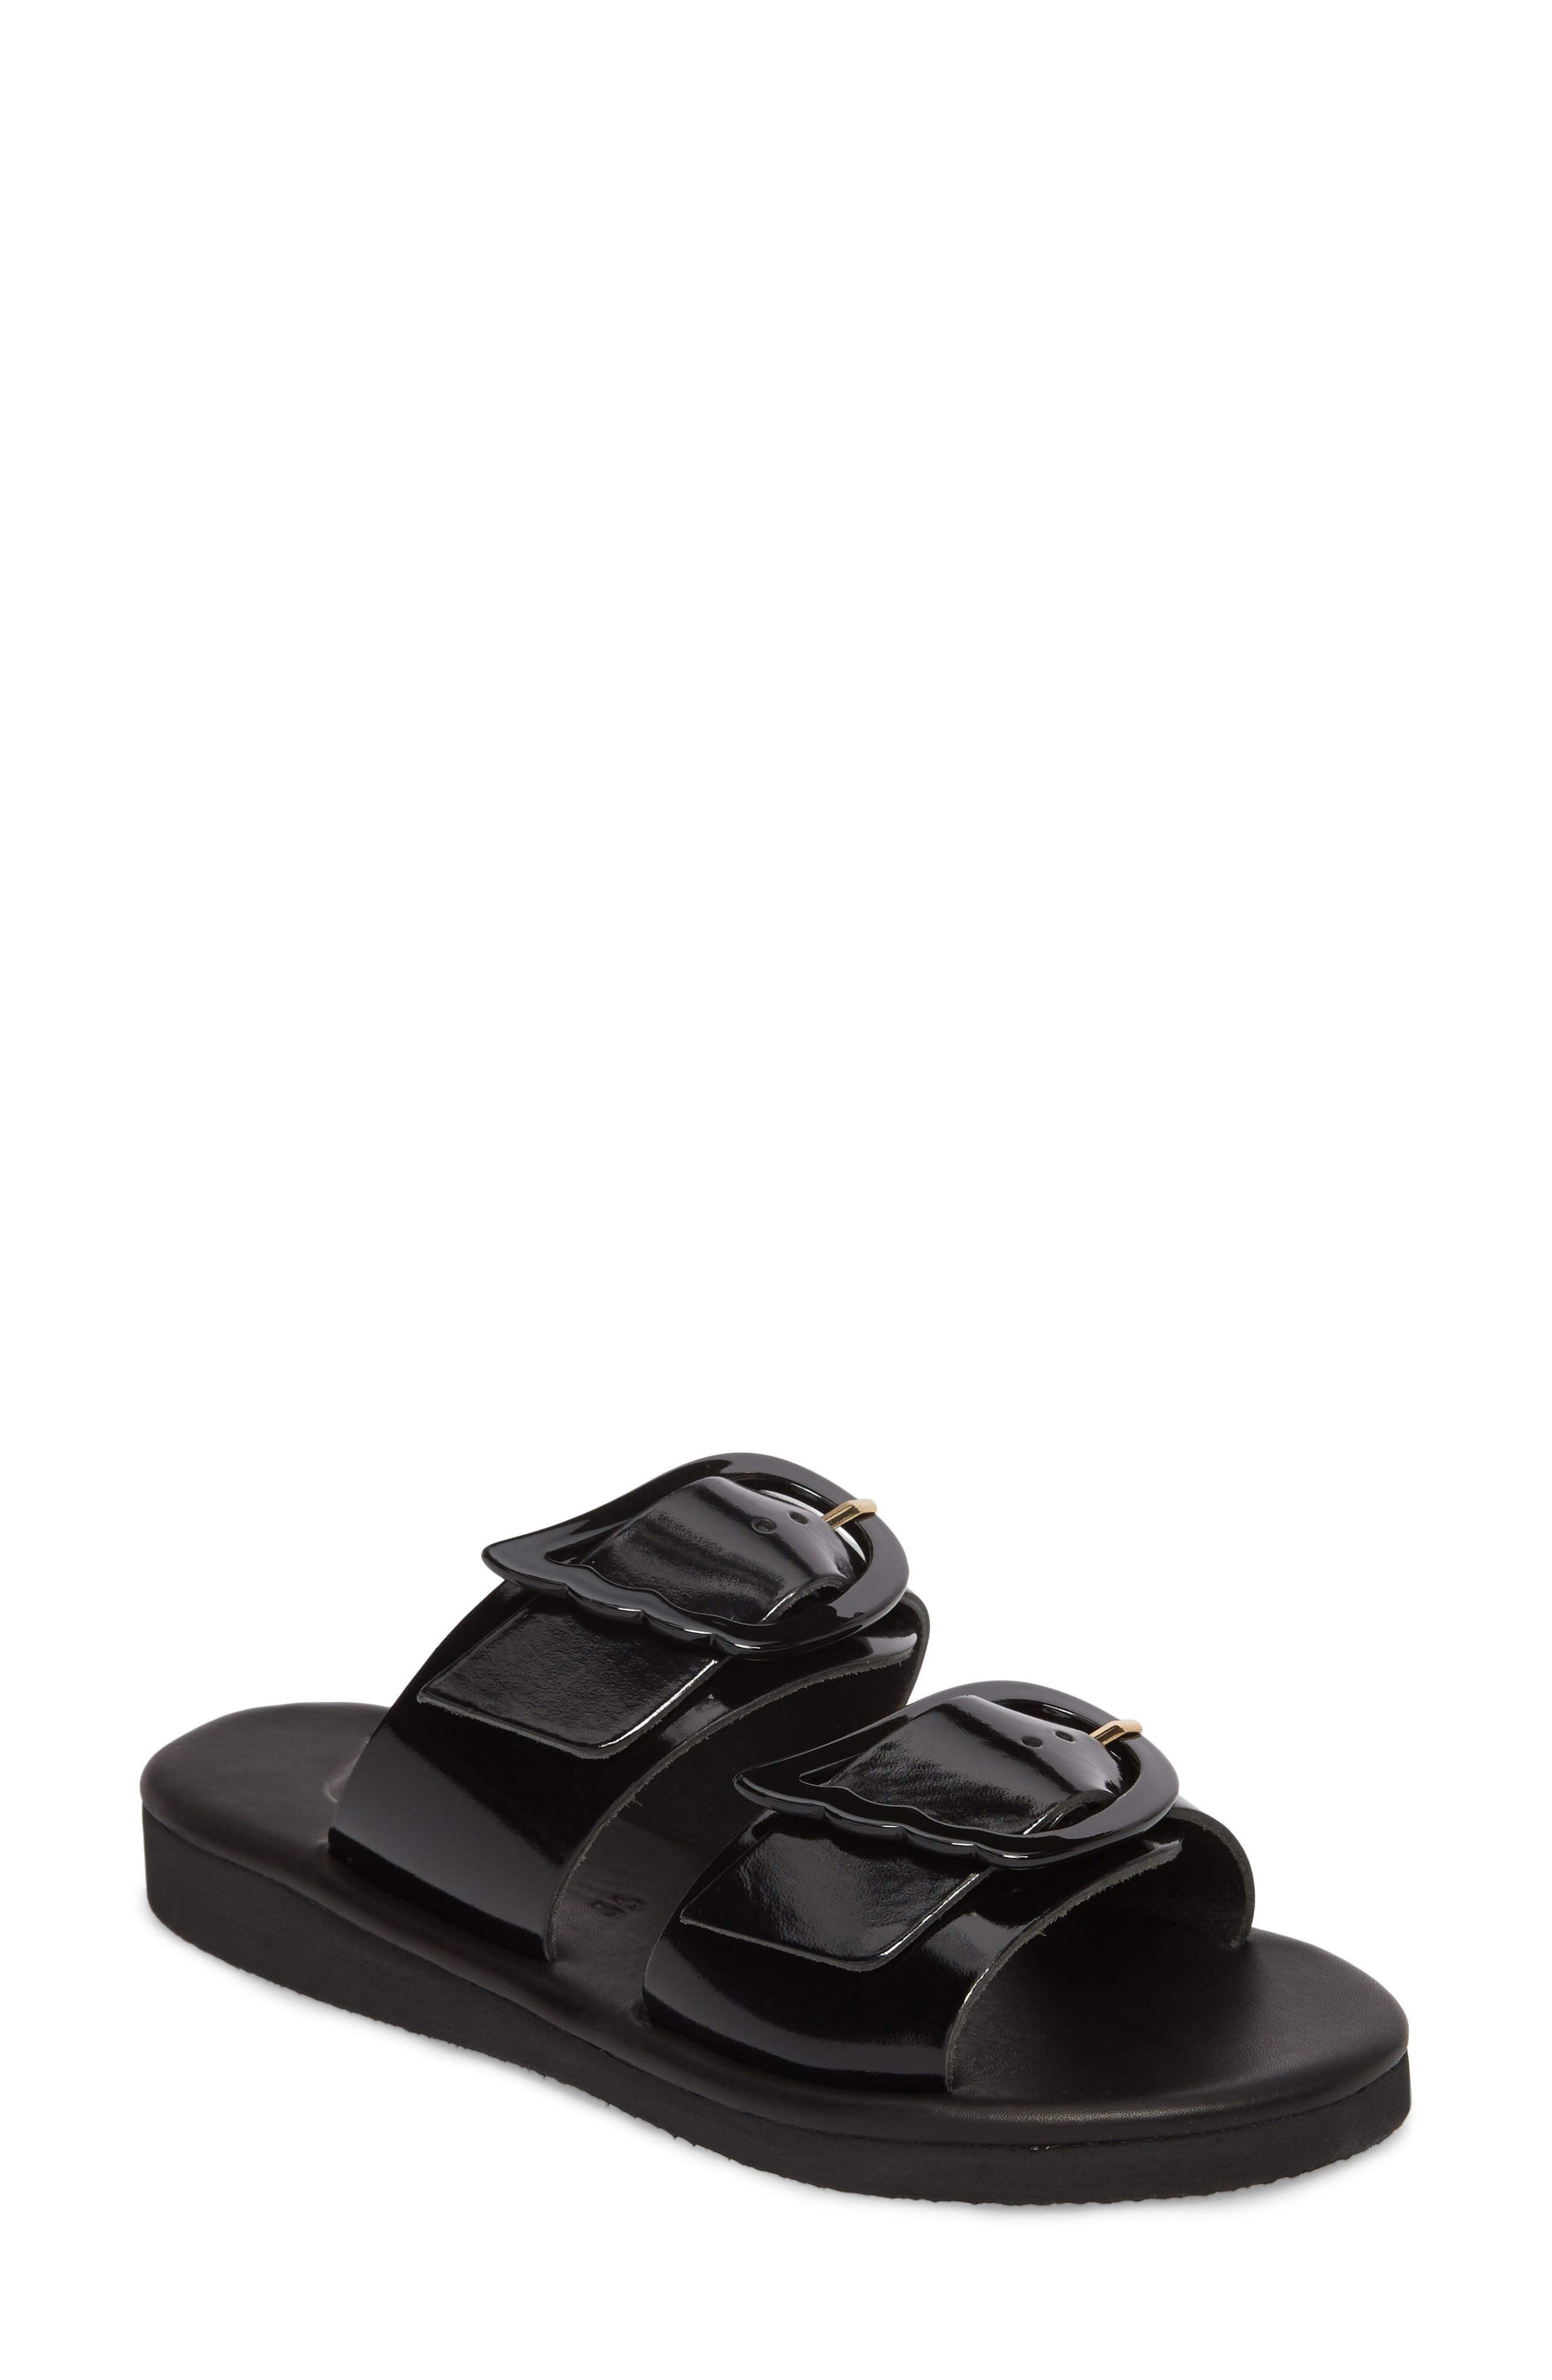 Iaso Slide Sandal,                         Main,                         color, Black